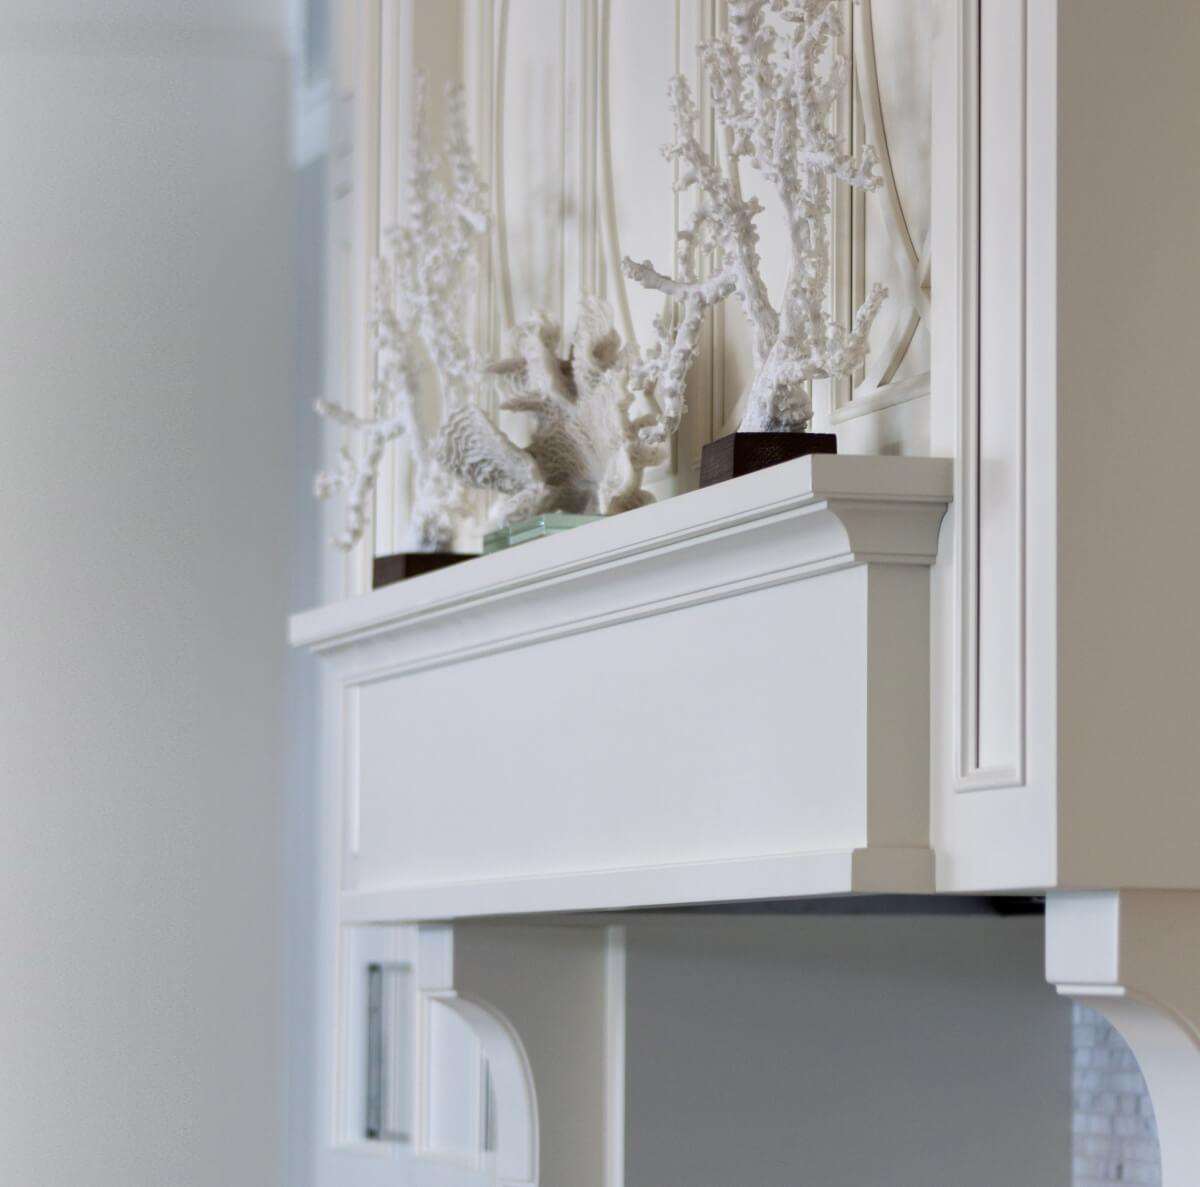 Dura Supreme Cabinetry design by Nanci Marsman of Standale Interiors, Michigan.